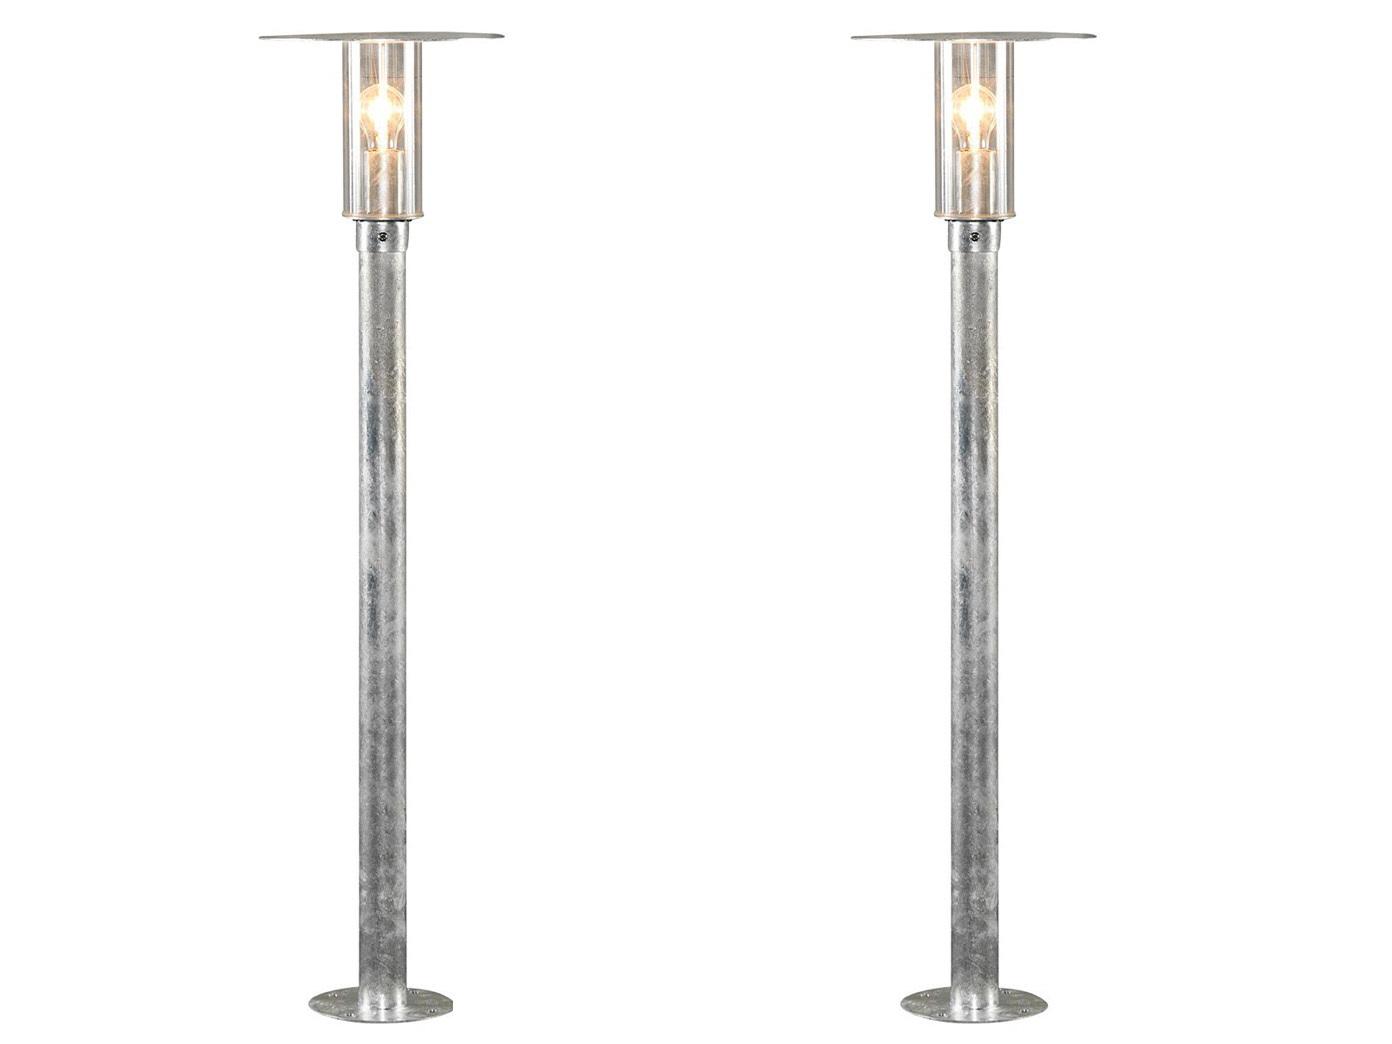 2er Set Konstsmide Lampada Esterno Lampada vie moda, infrangibile, LAMPADA ESTERNO